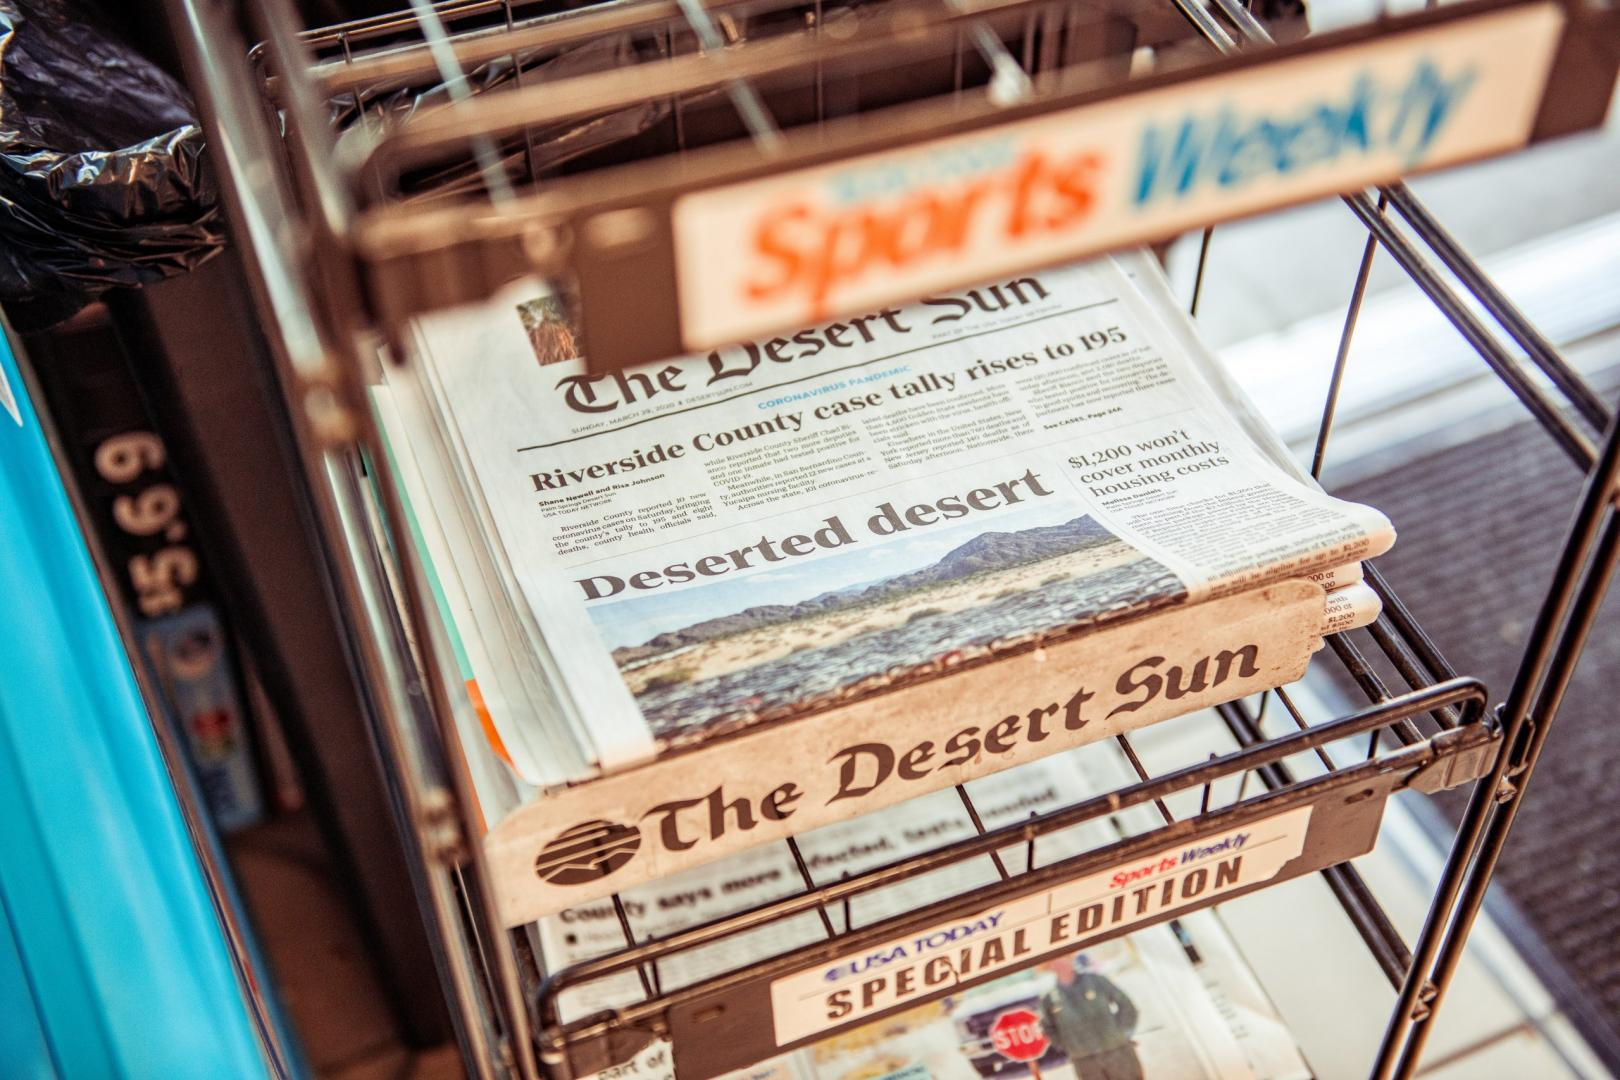 Krant The Desert Sun bij tankstation